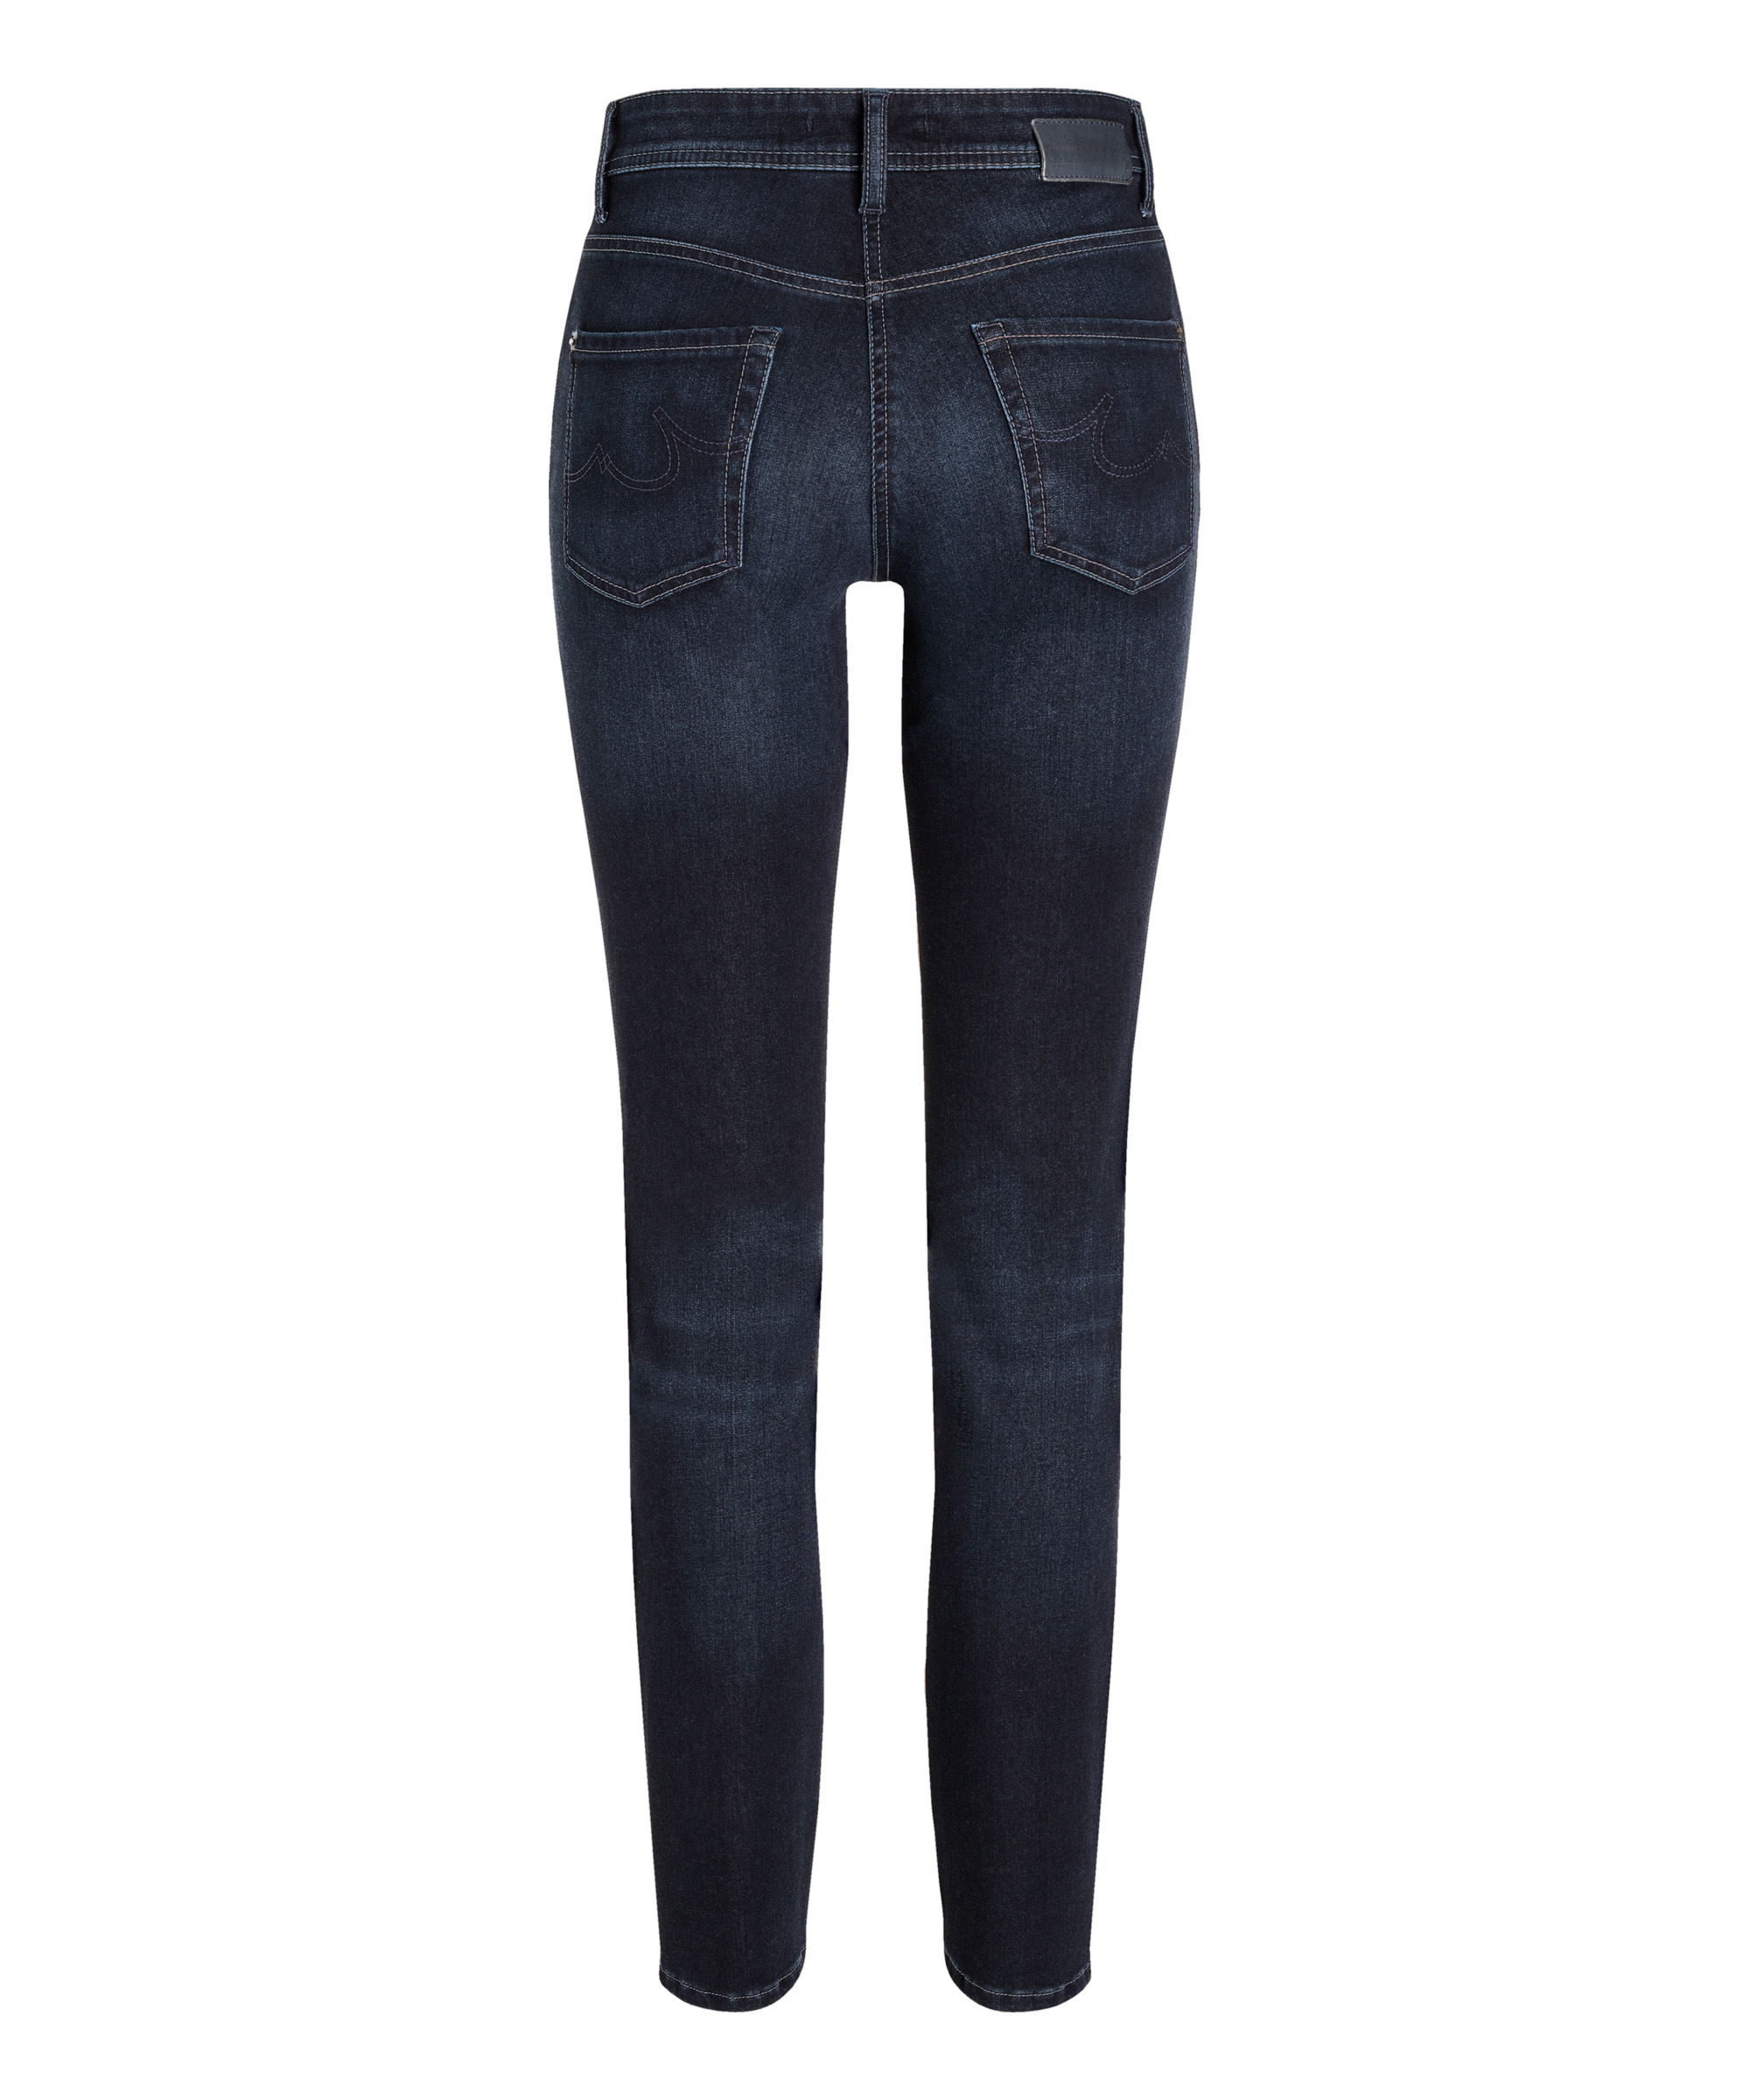 Cambio Jeans Parla DEEP OCEAN USED